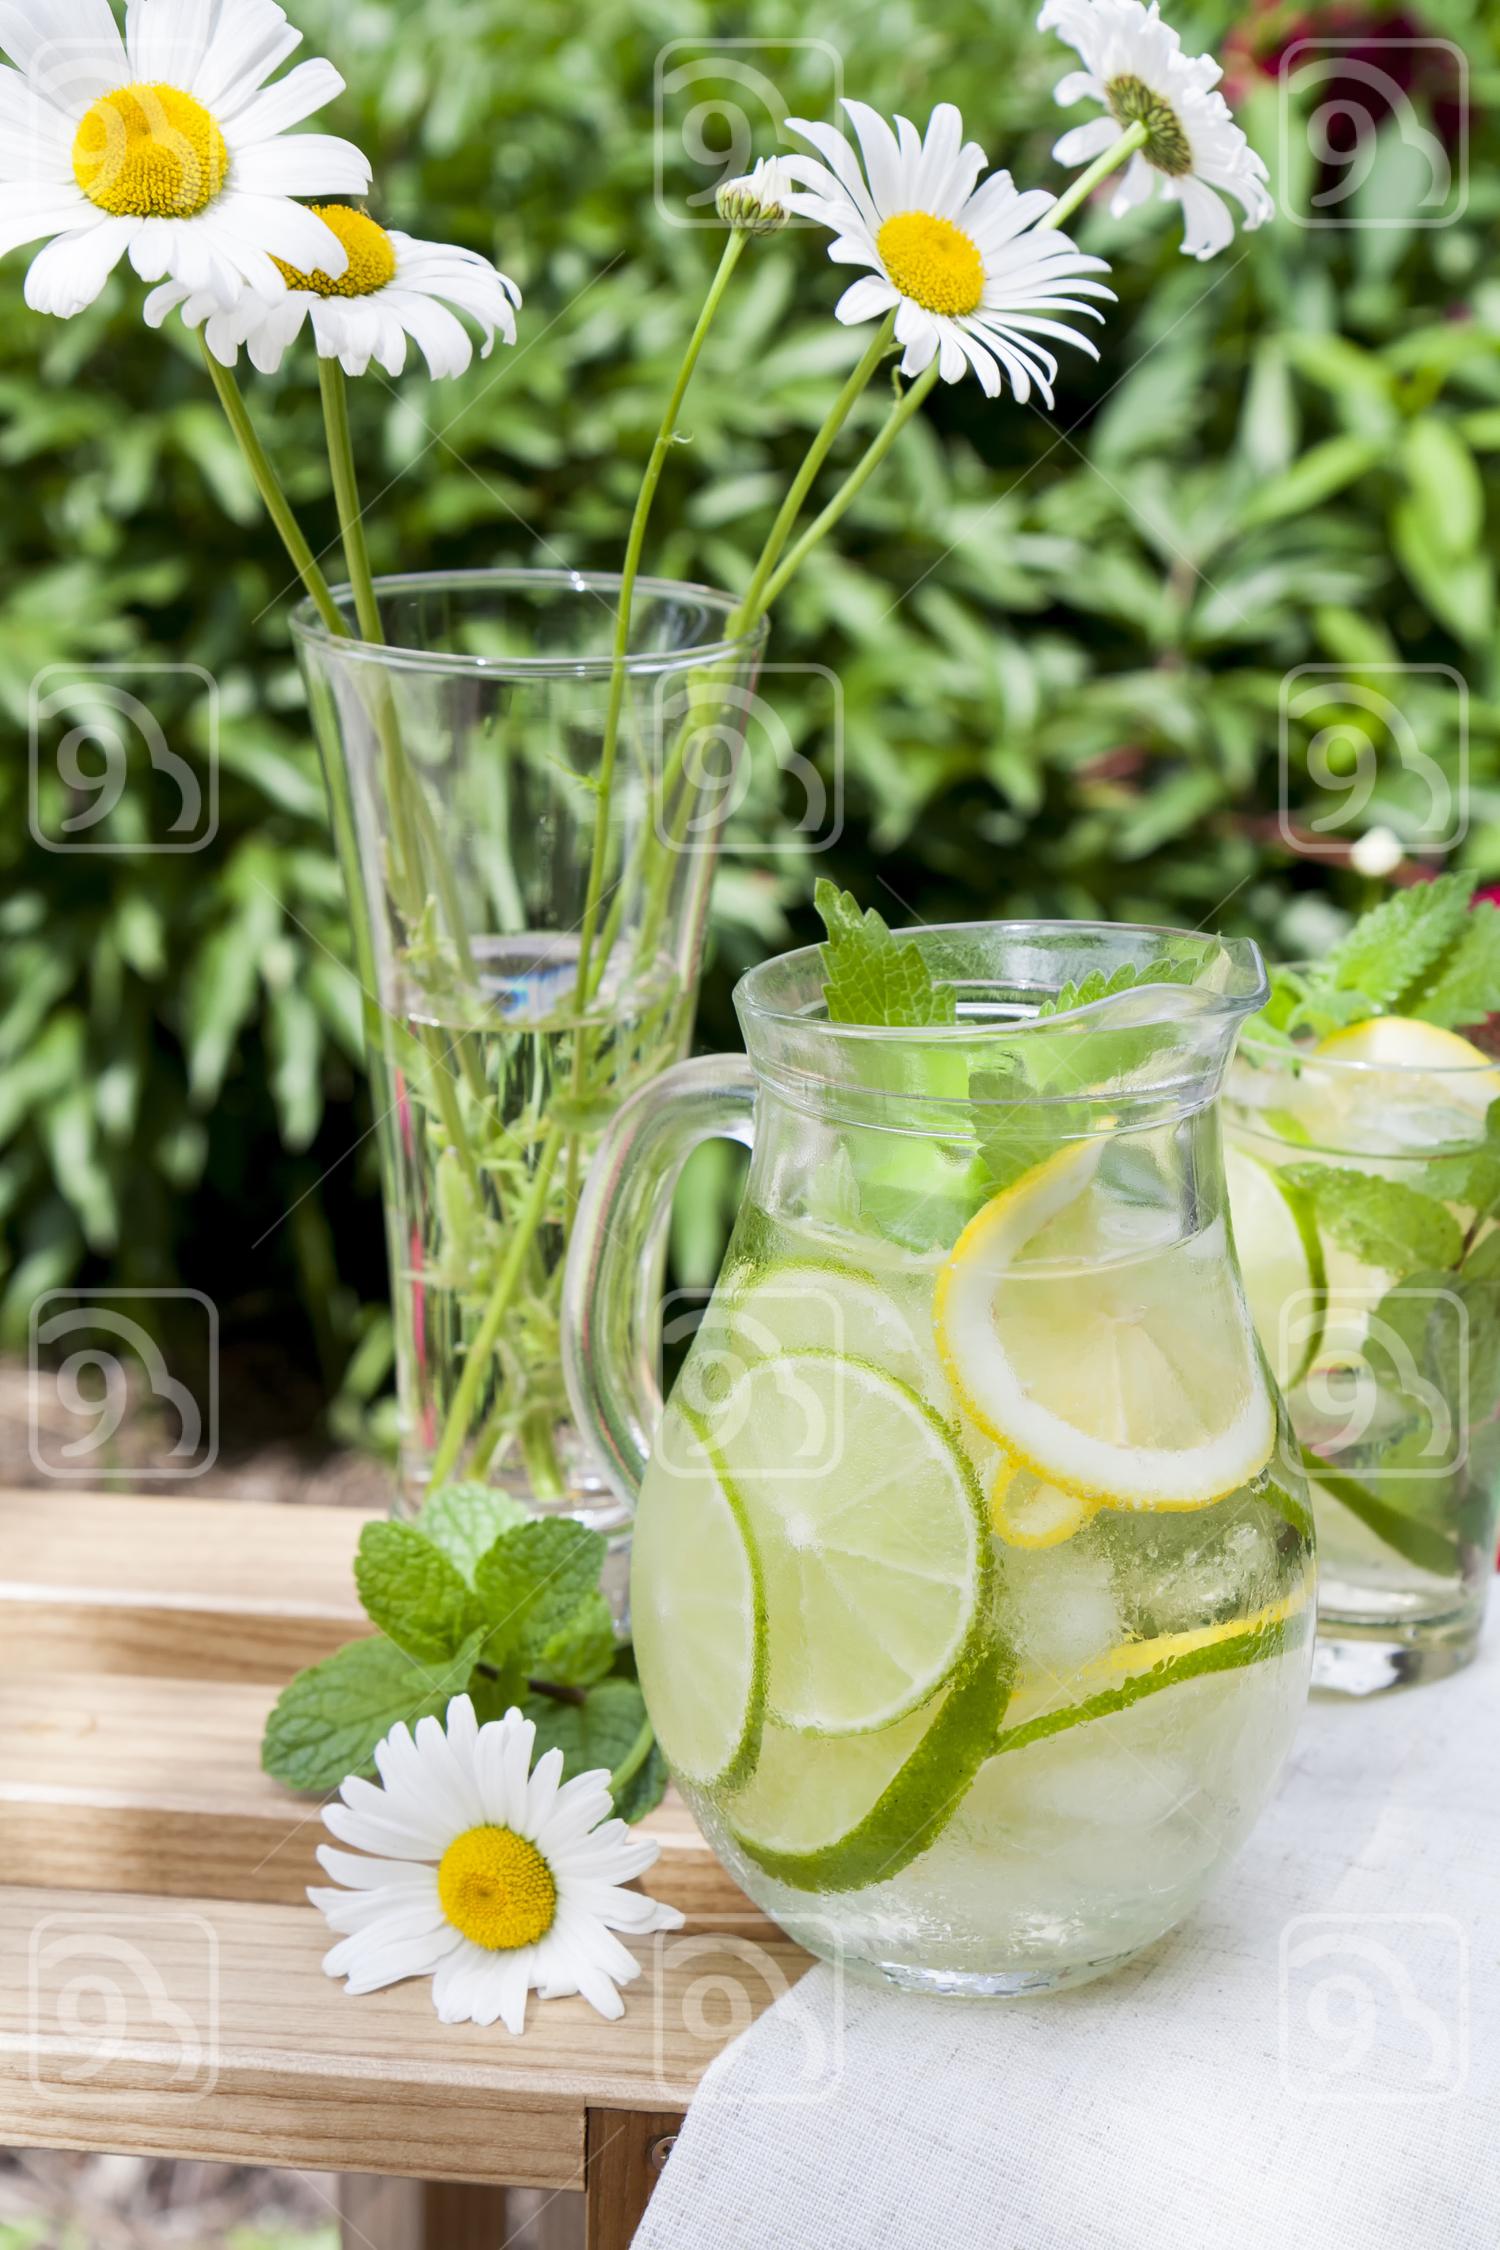 Cold fresh lemonade with lemon, lime and mint